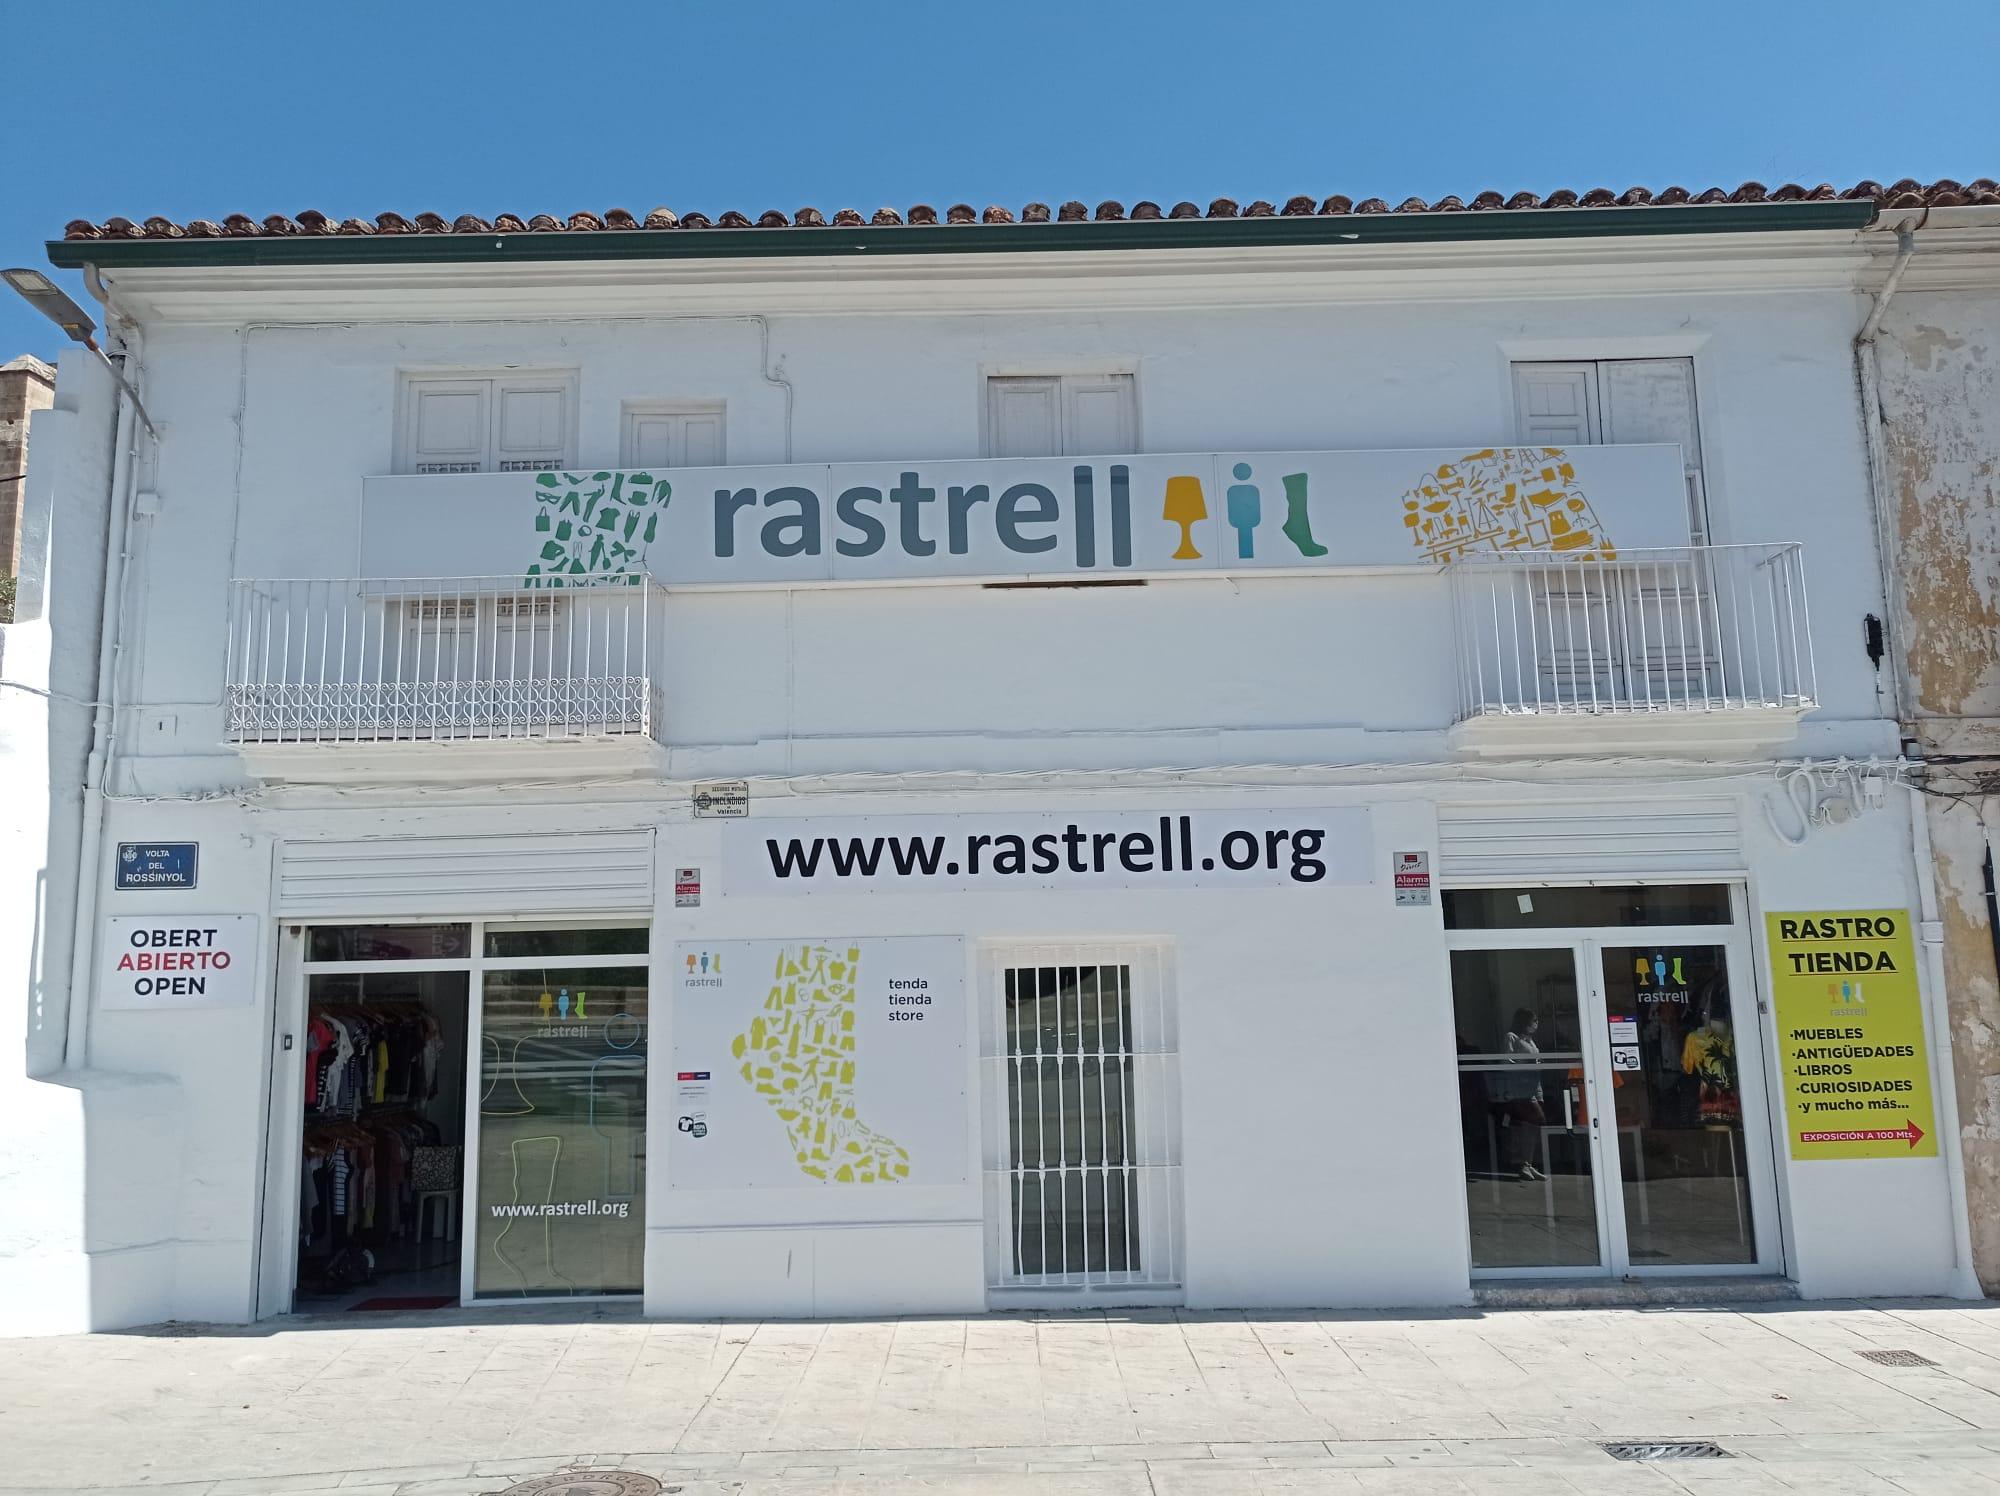 RASTRELL